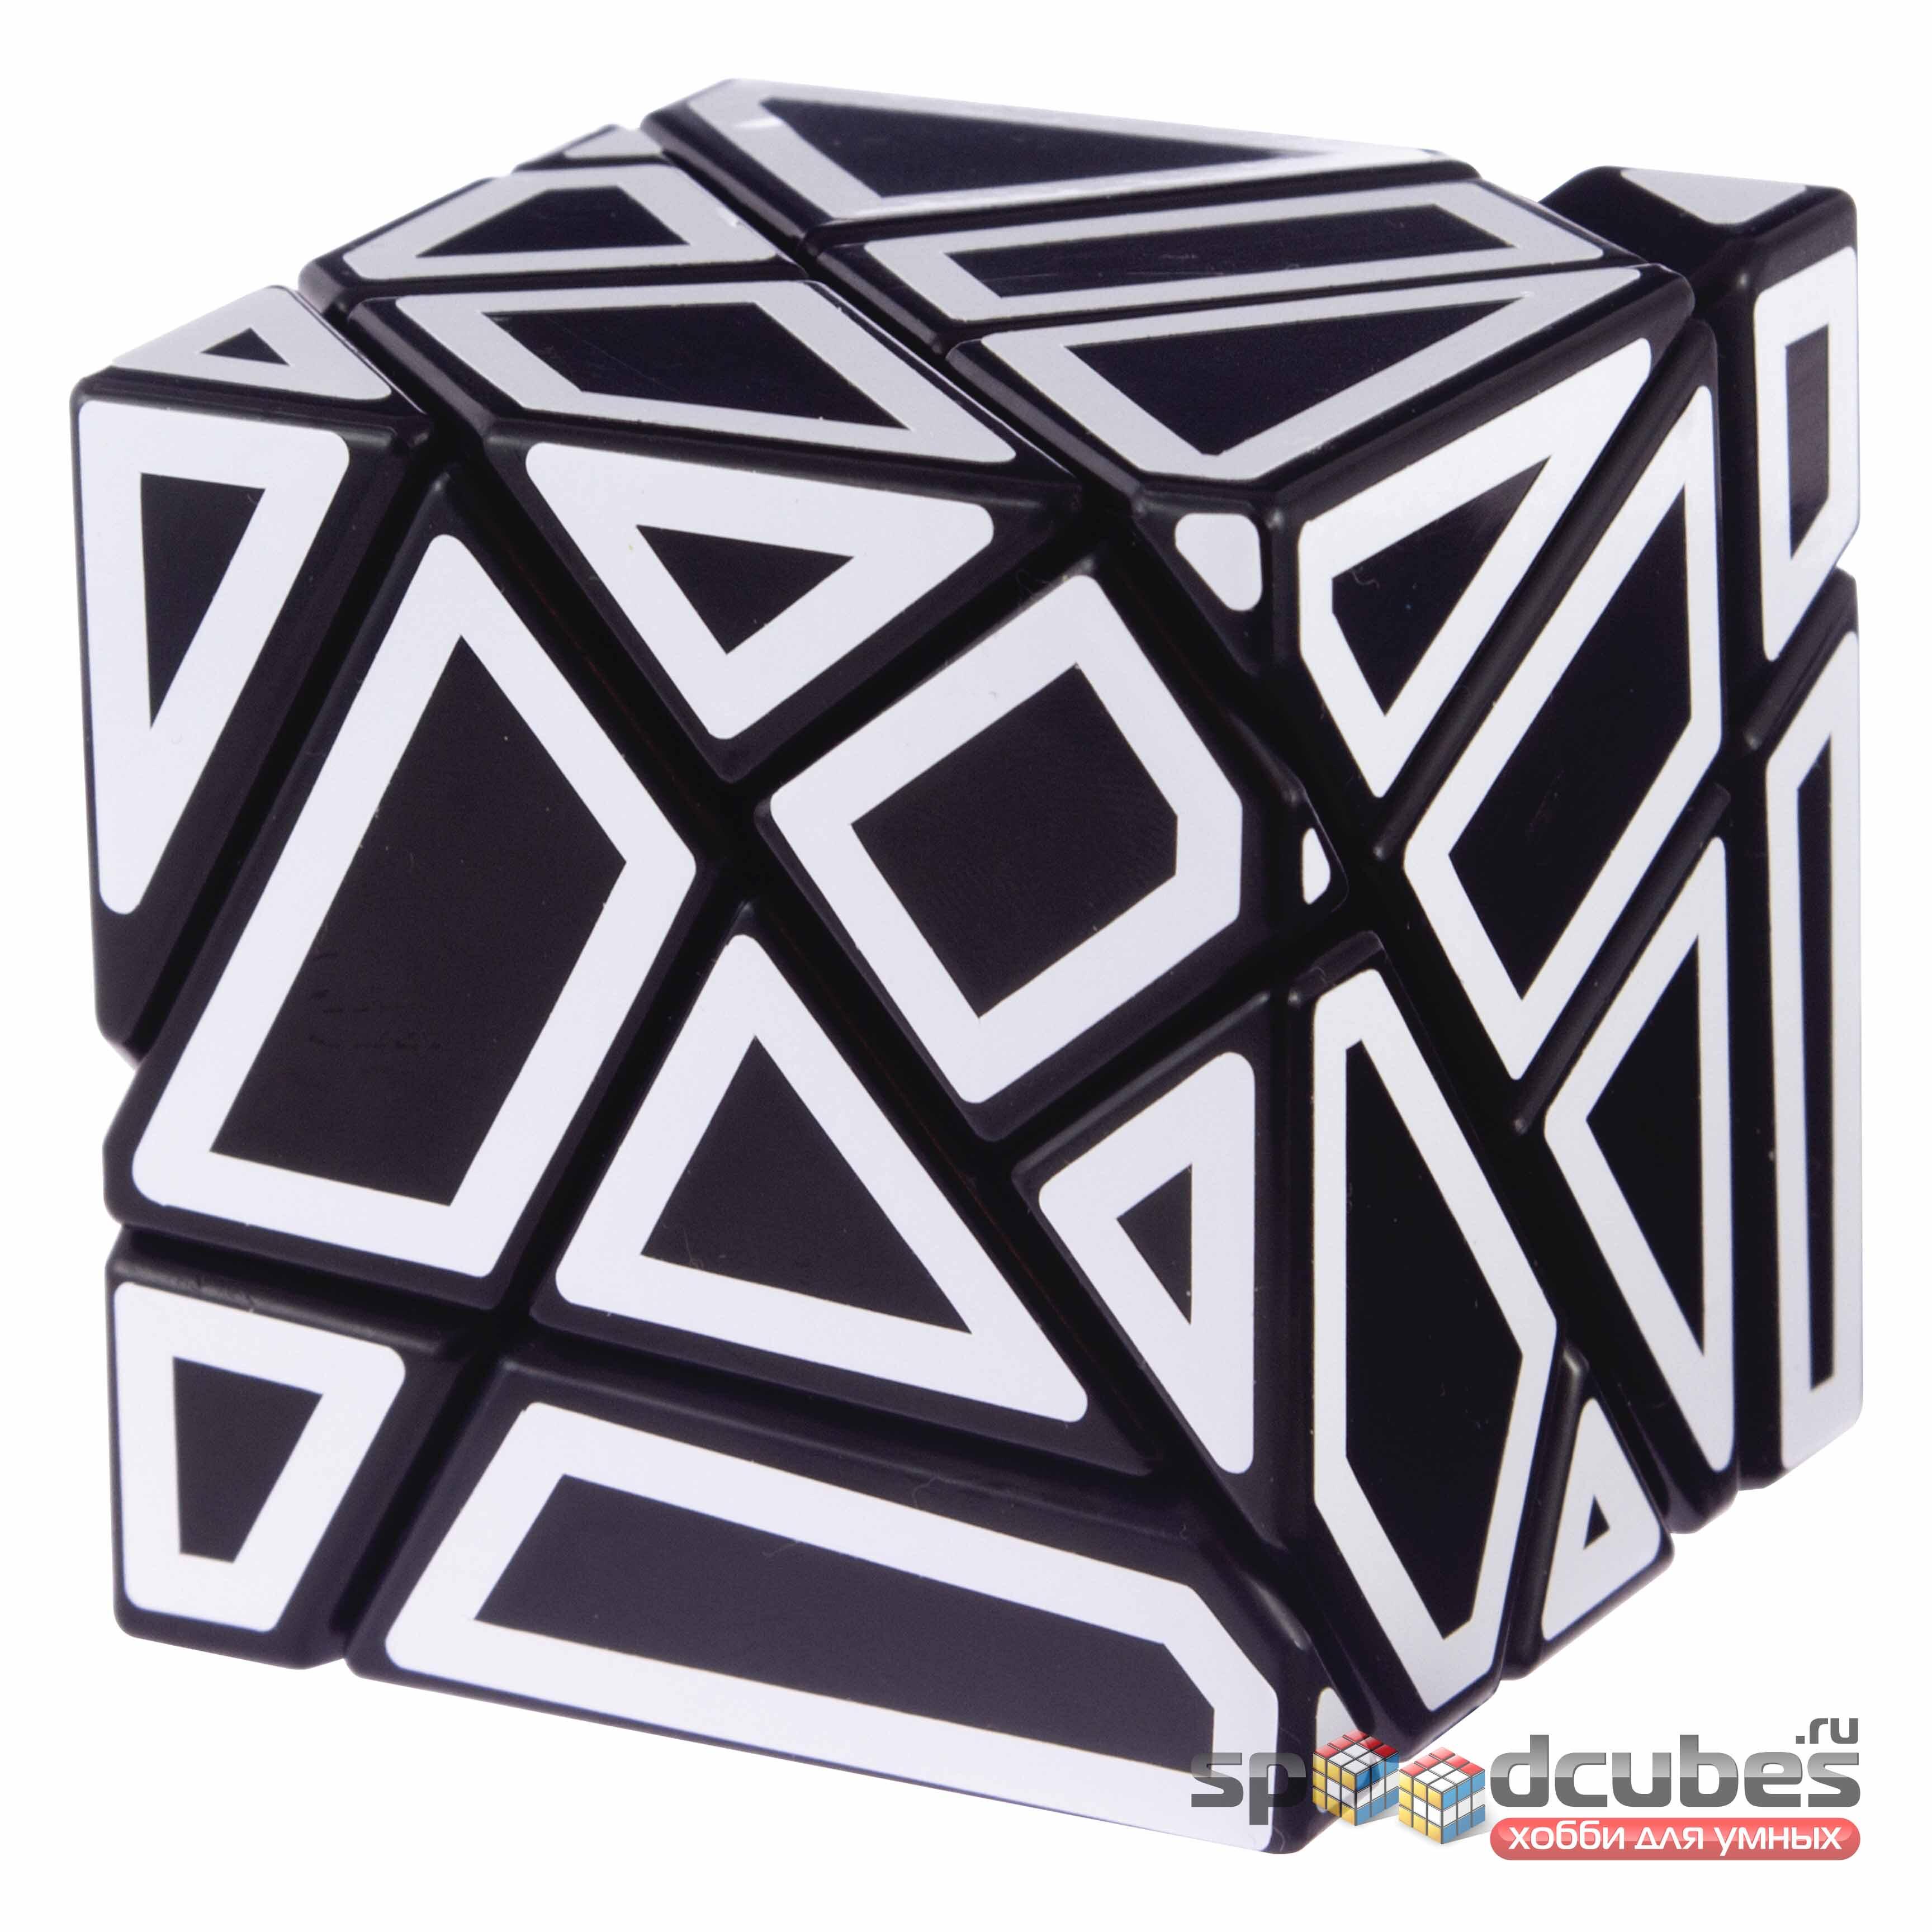 Ninja Ghost Cube (M Stckers)